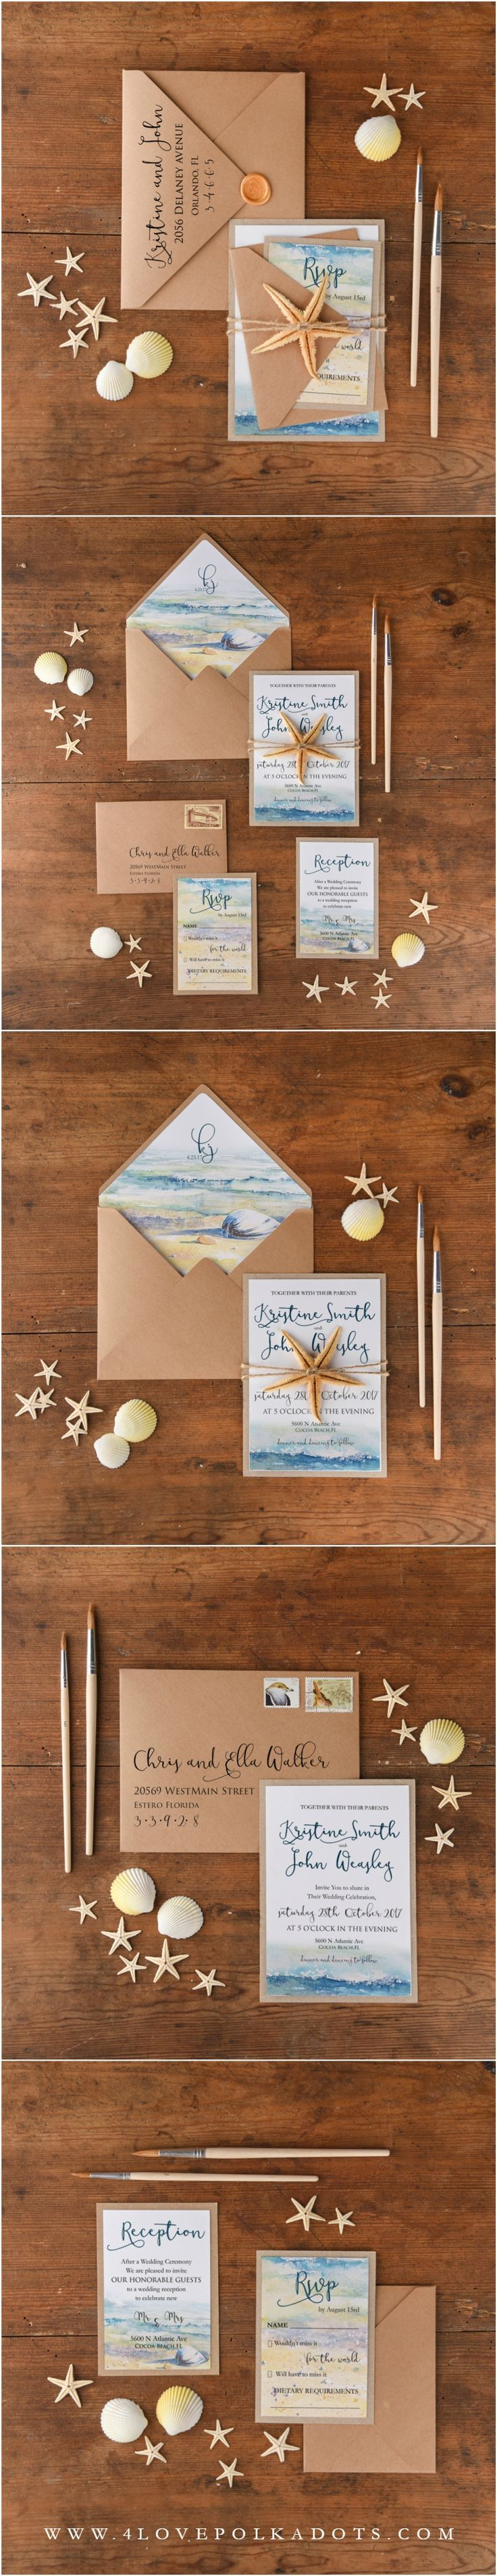 Watercolor Beach Wedding invitations #beachwedding #starfish #watercolor #romantic #rustic #weddingideas